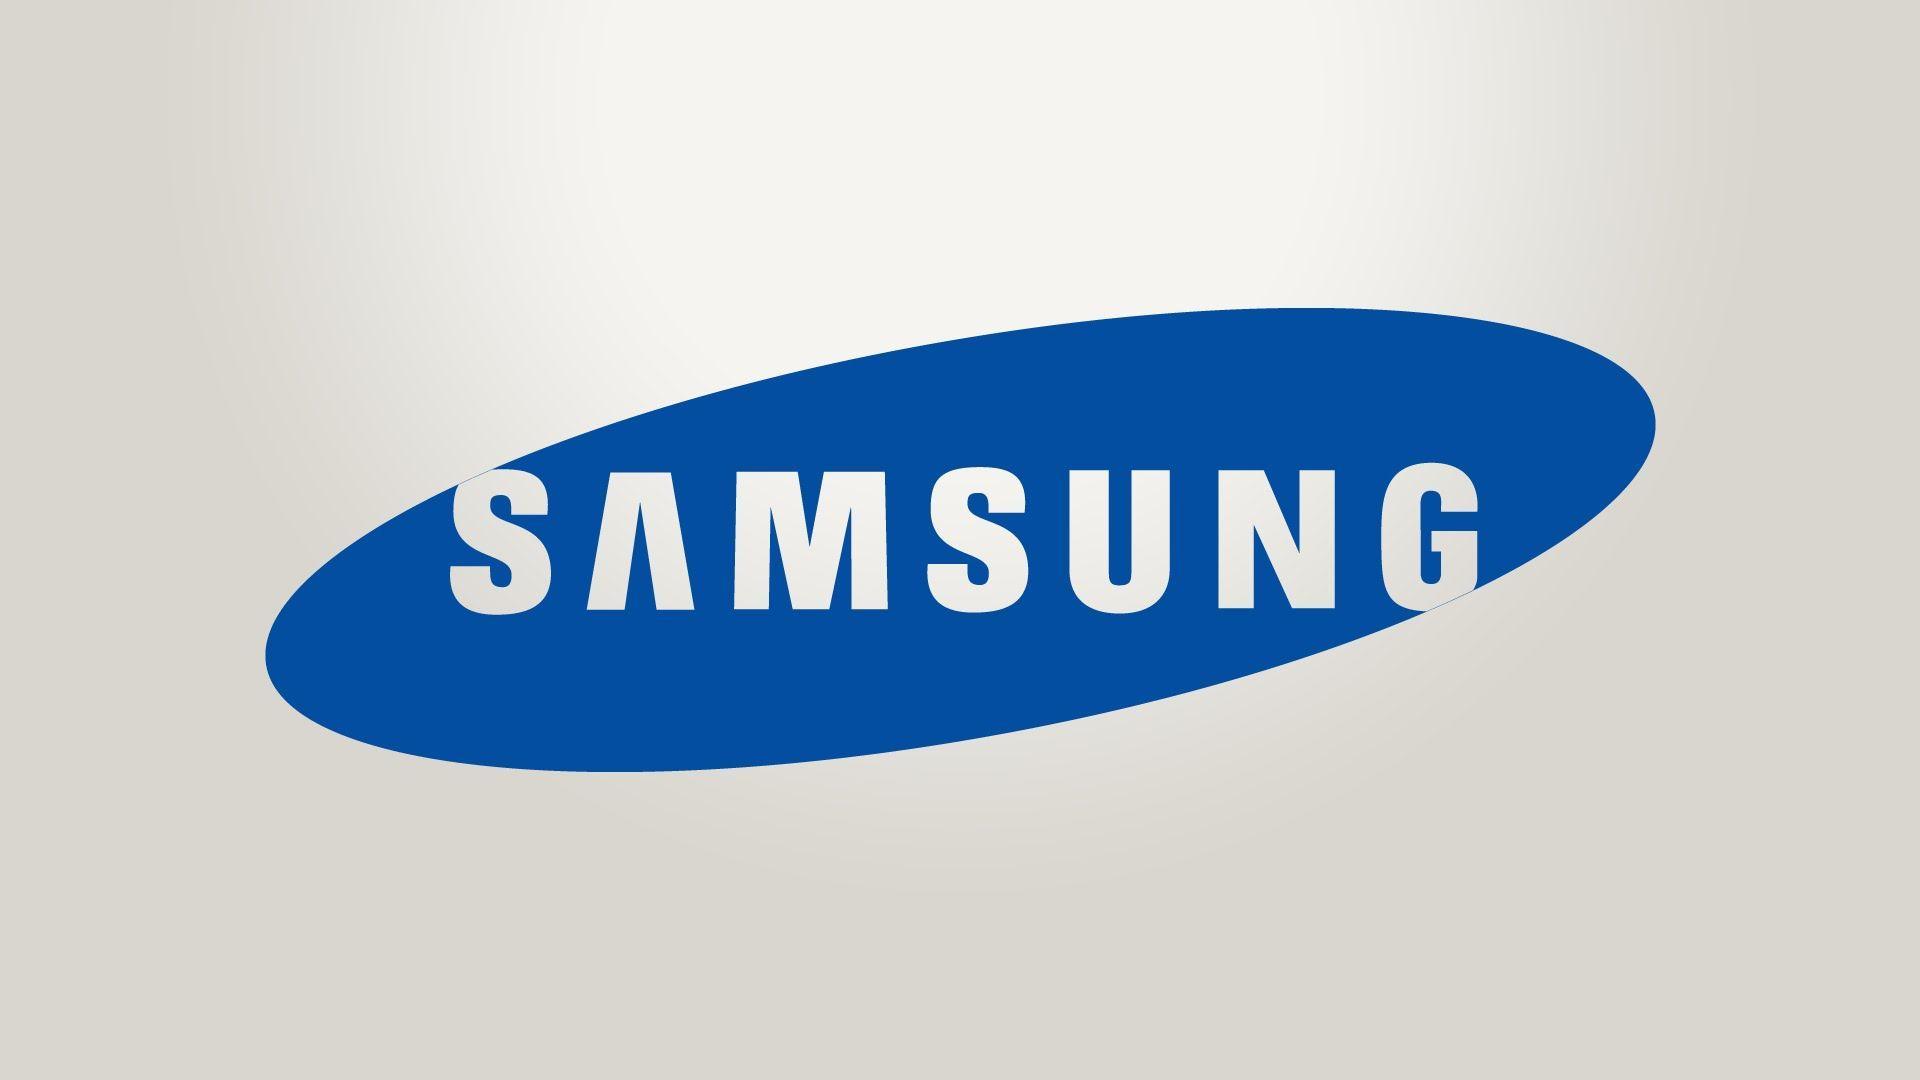 Samsung Mobile Logo Logodix